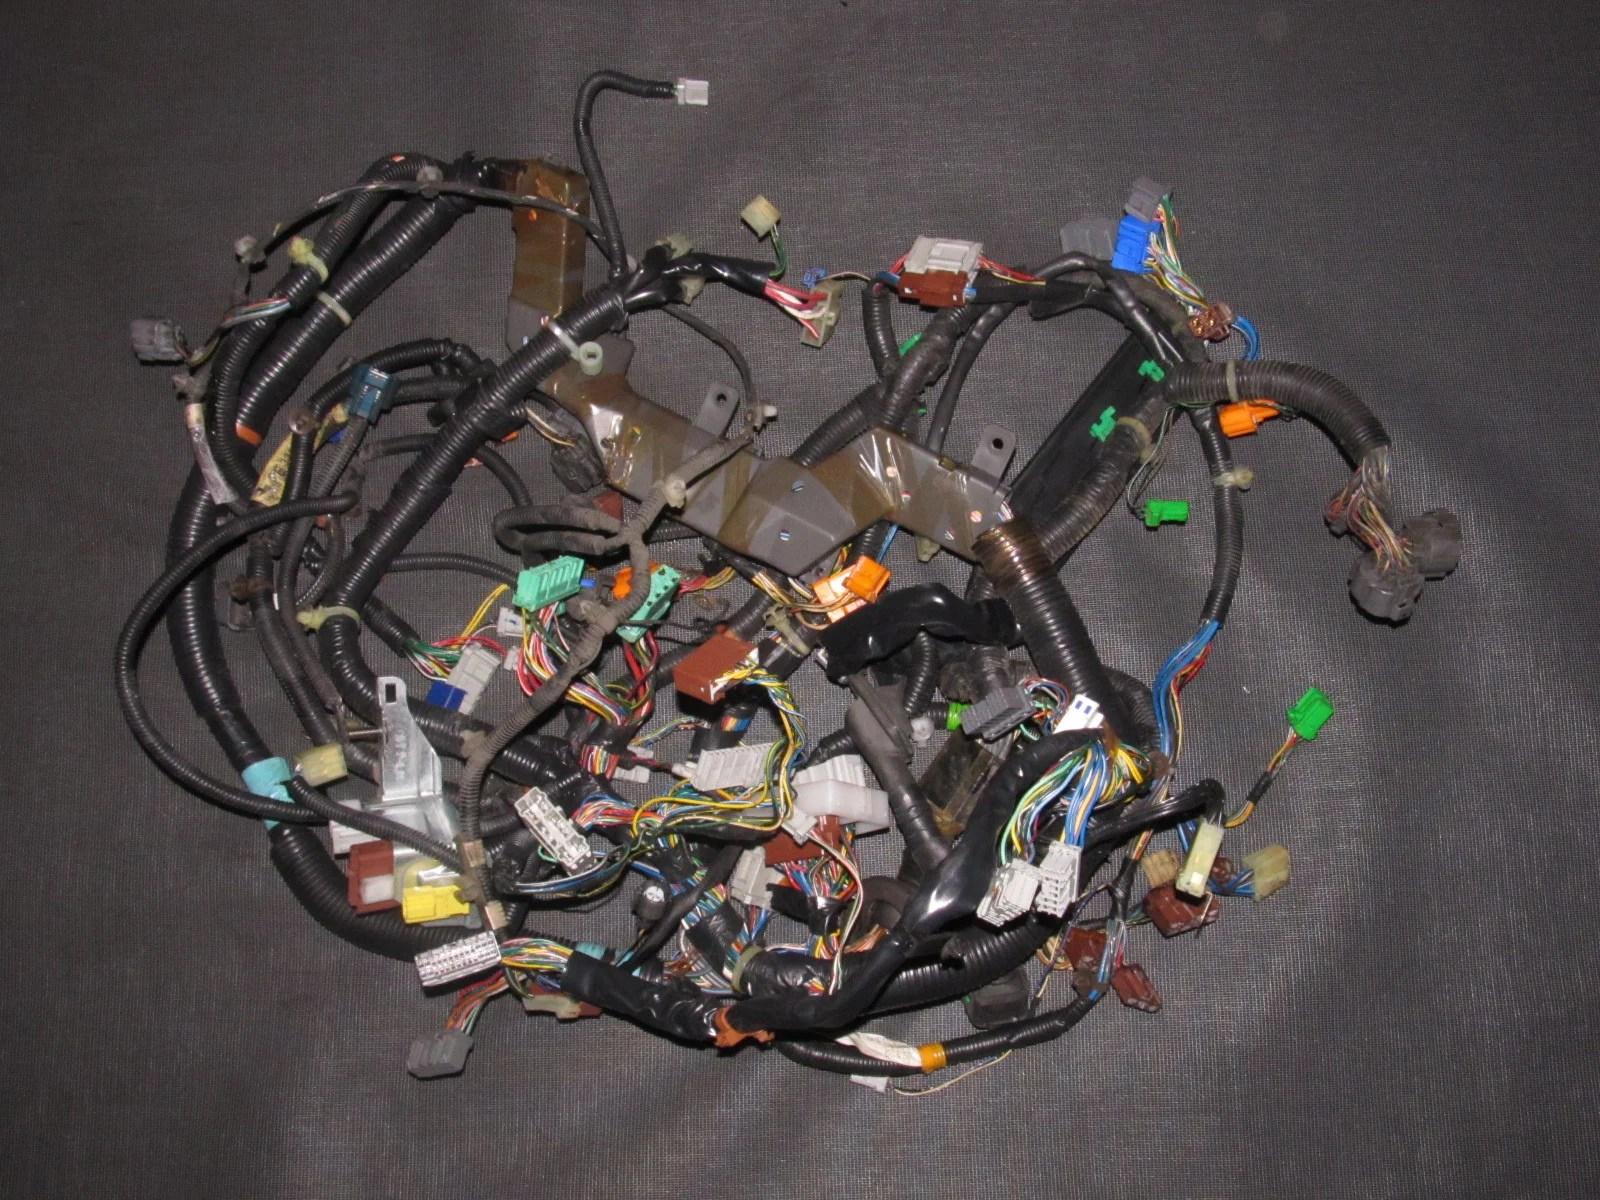 small resolution of b18b1 wiring harness wiring diagrams b18b1 vtec 96 01 acura integra oem b18b1 headlight ecu fuse